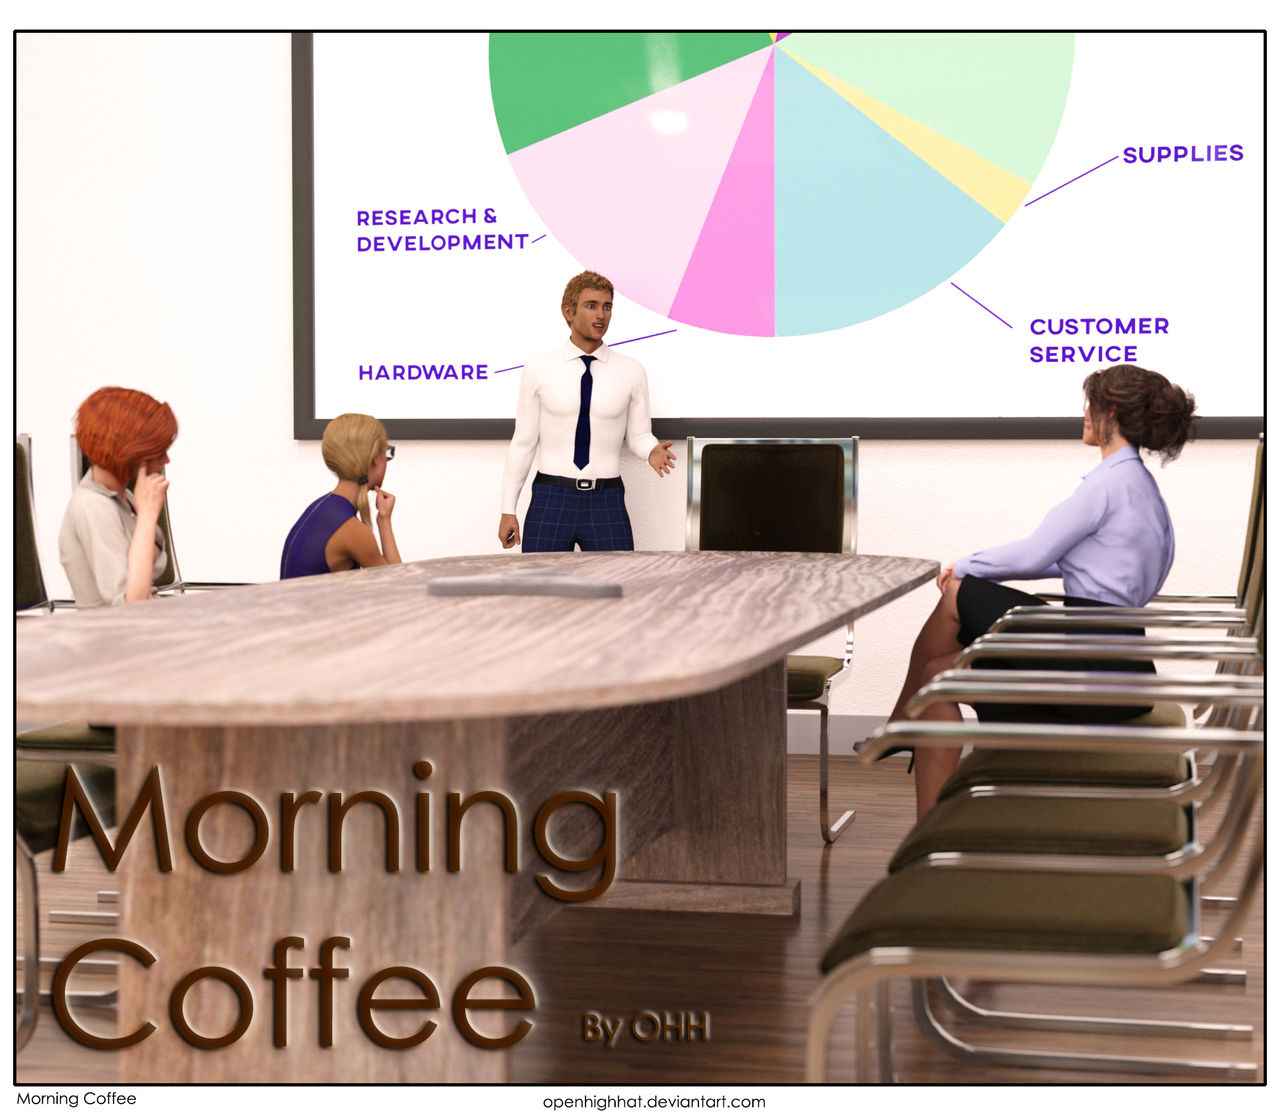 Morning Coffee image 1